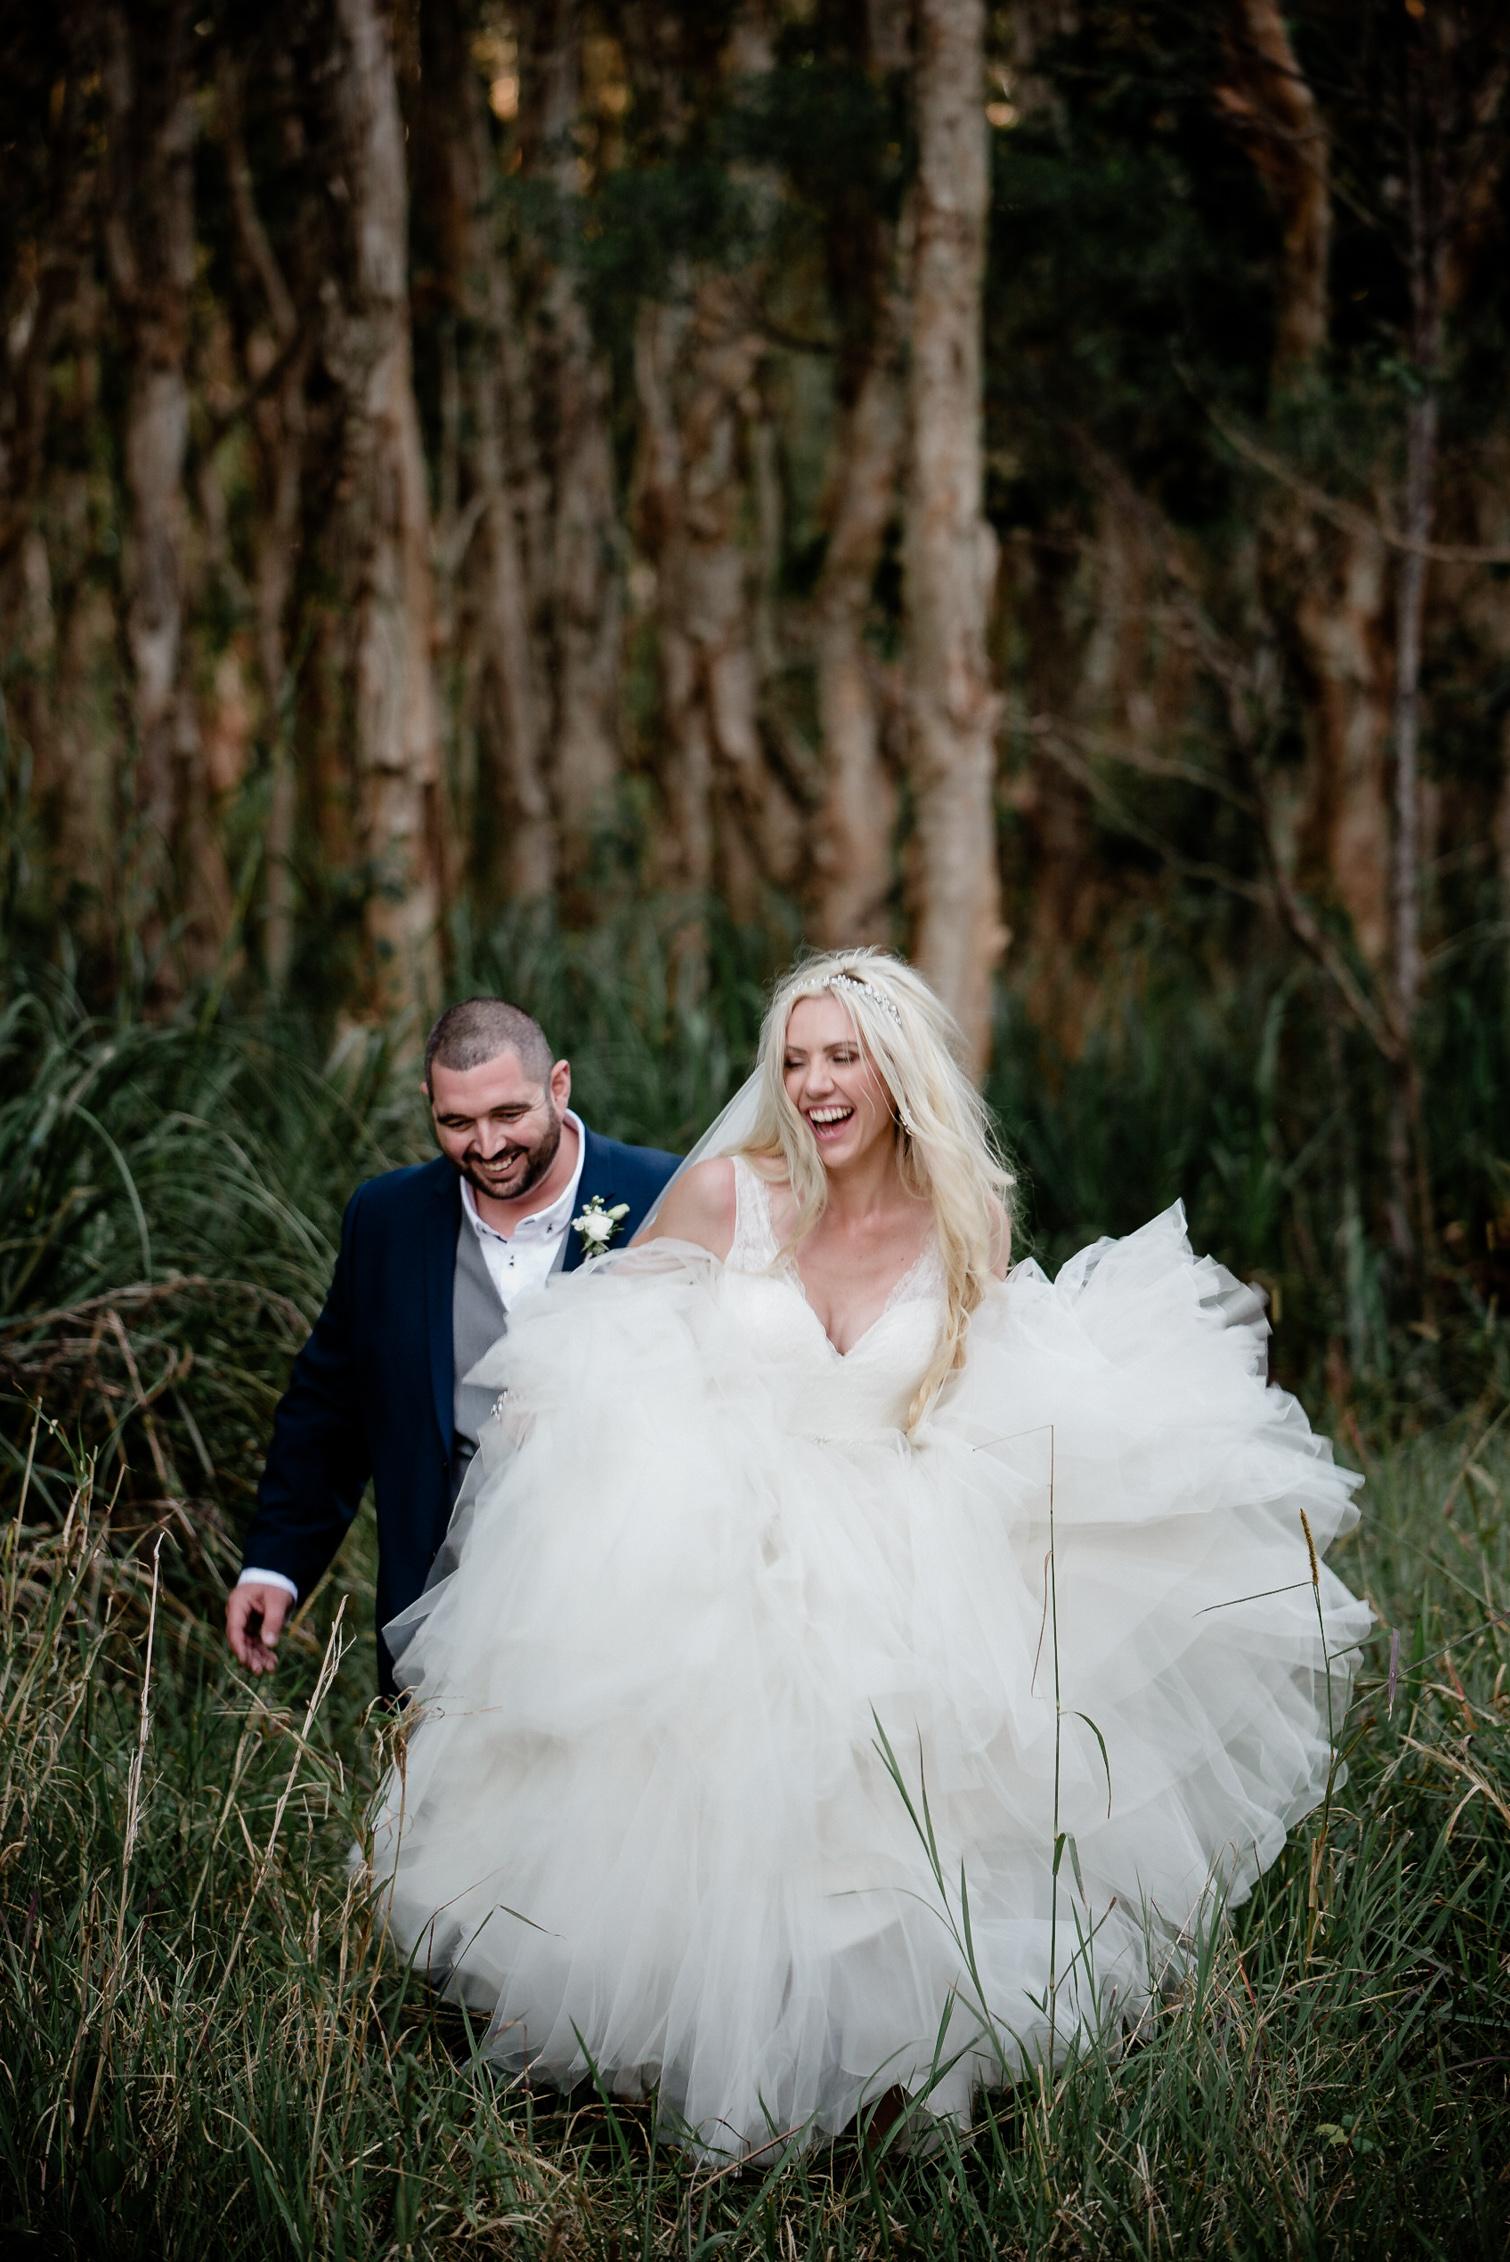 The_Belongil_Byron_Bay_Weddings_New_Black_Studios-145.jpg